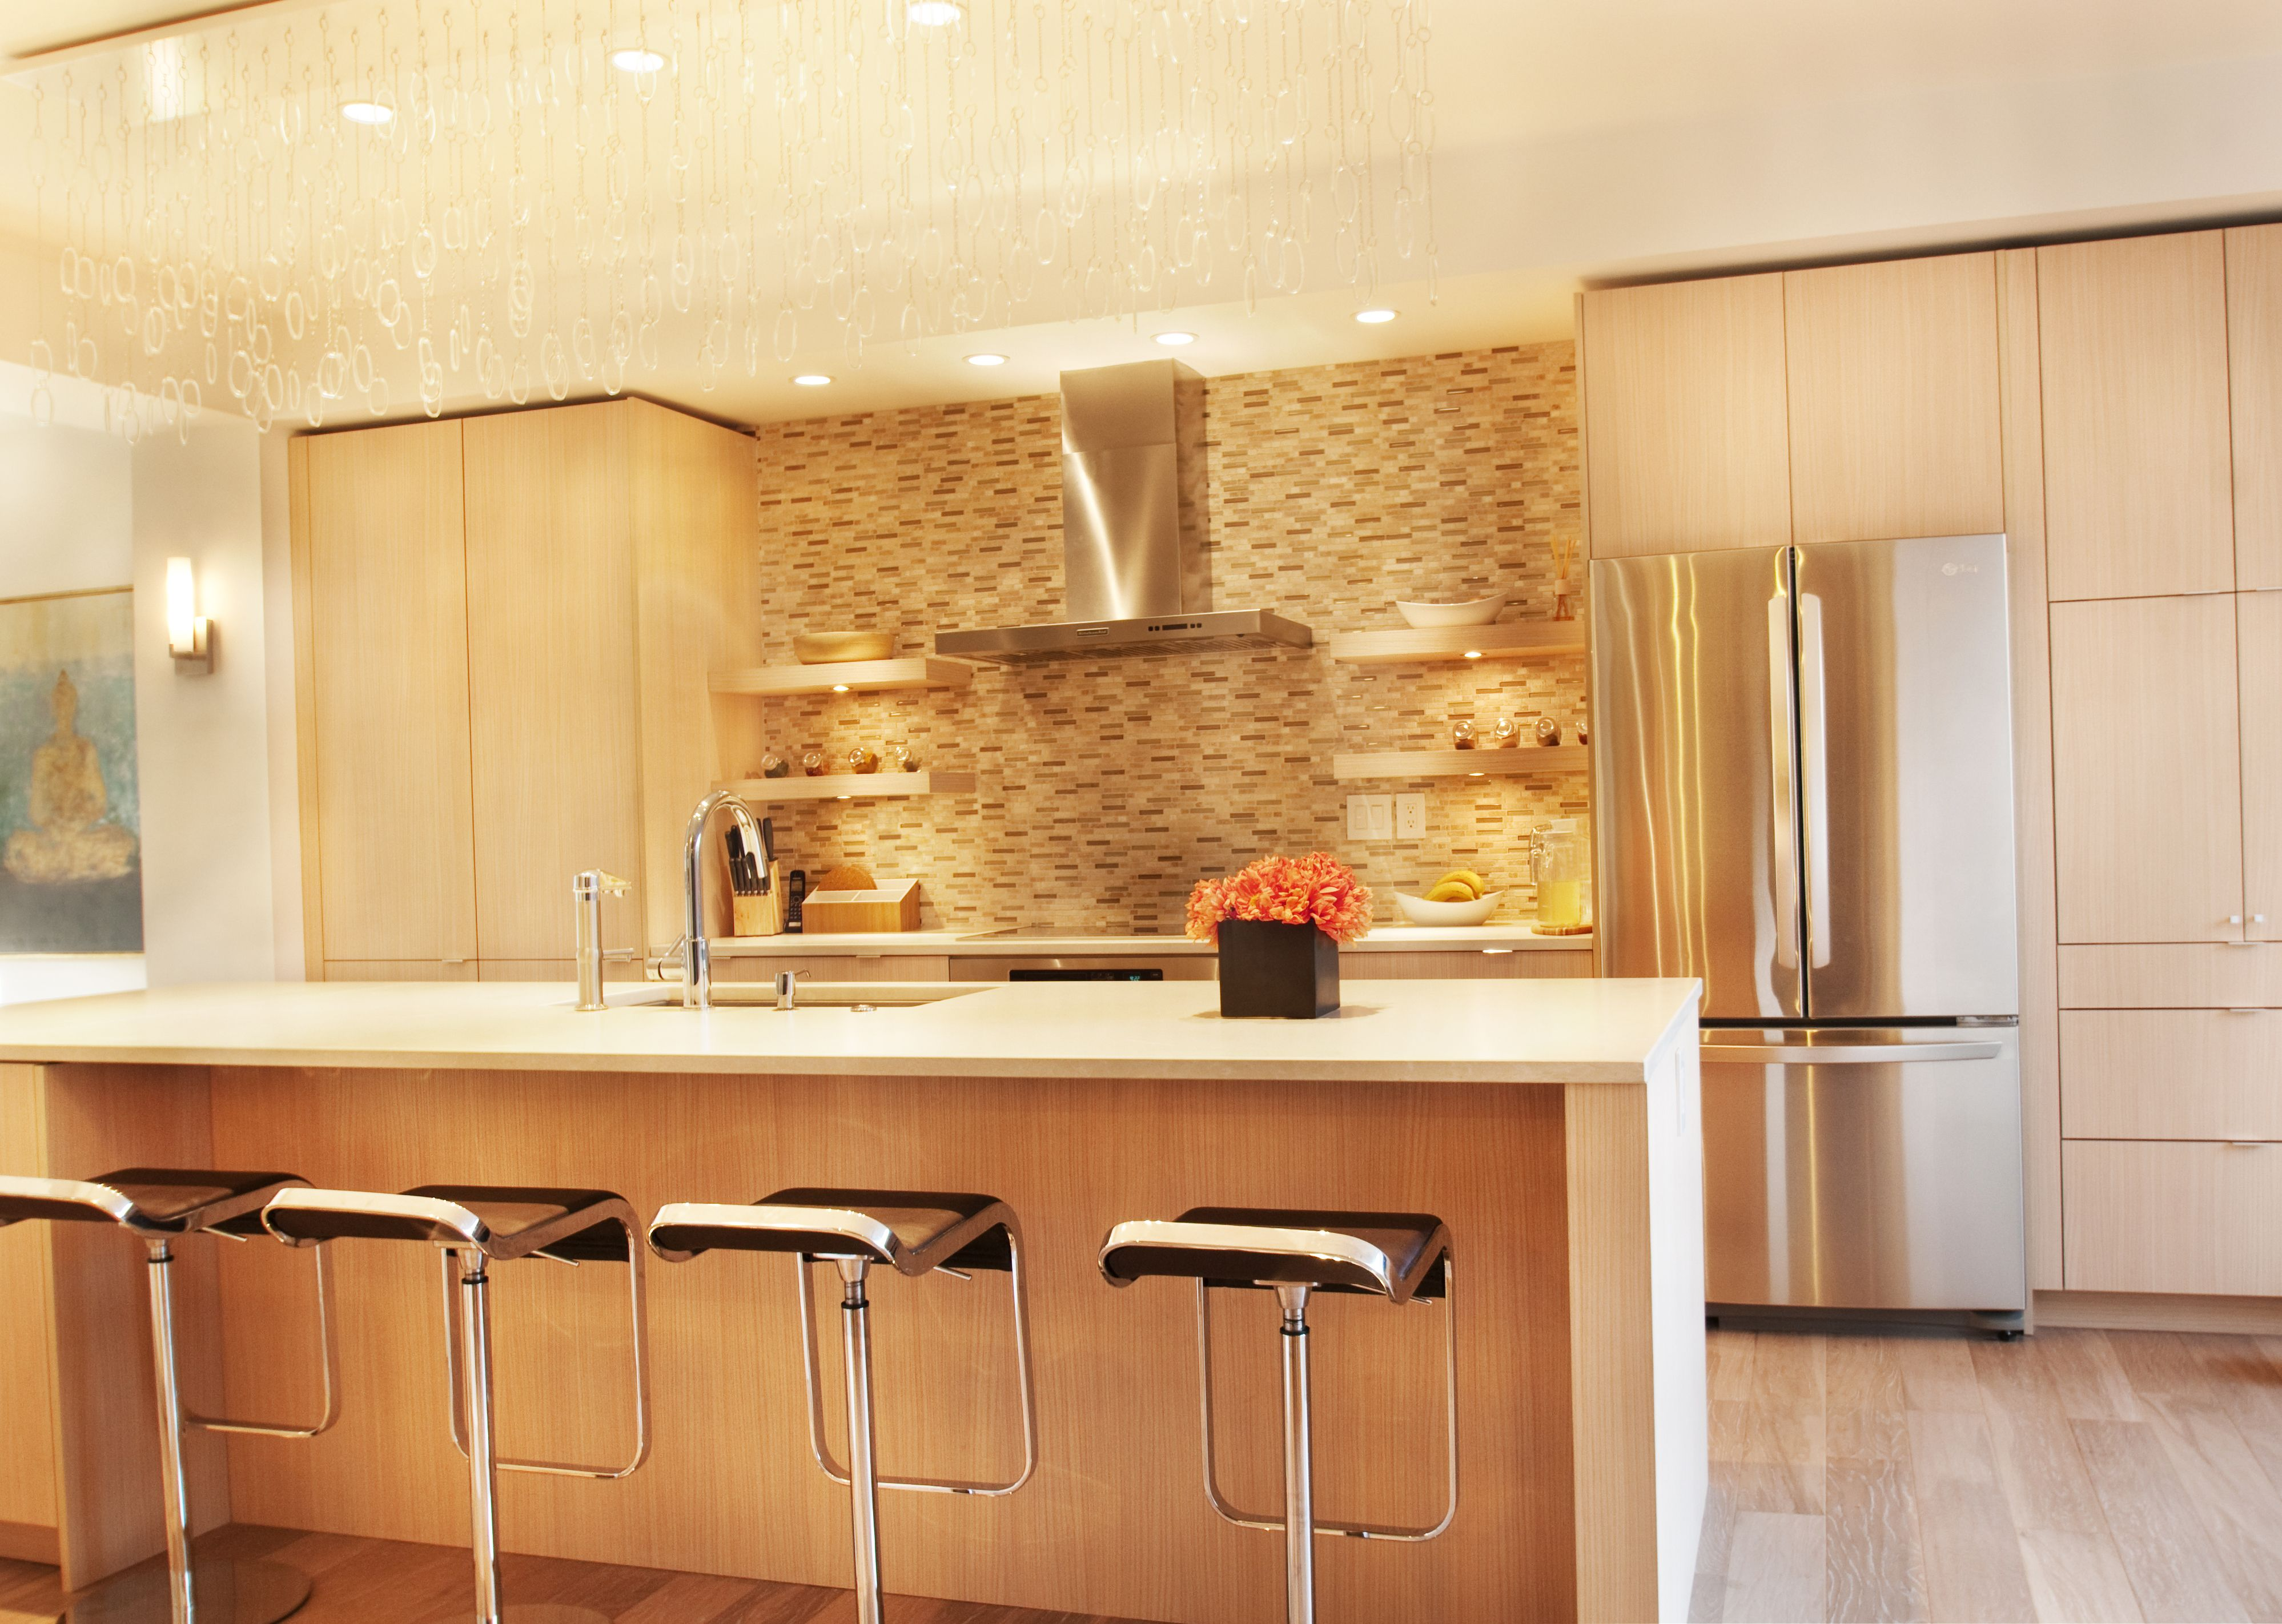 kitchen - john's creek, ga residence. interior design by michael